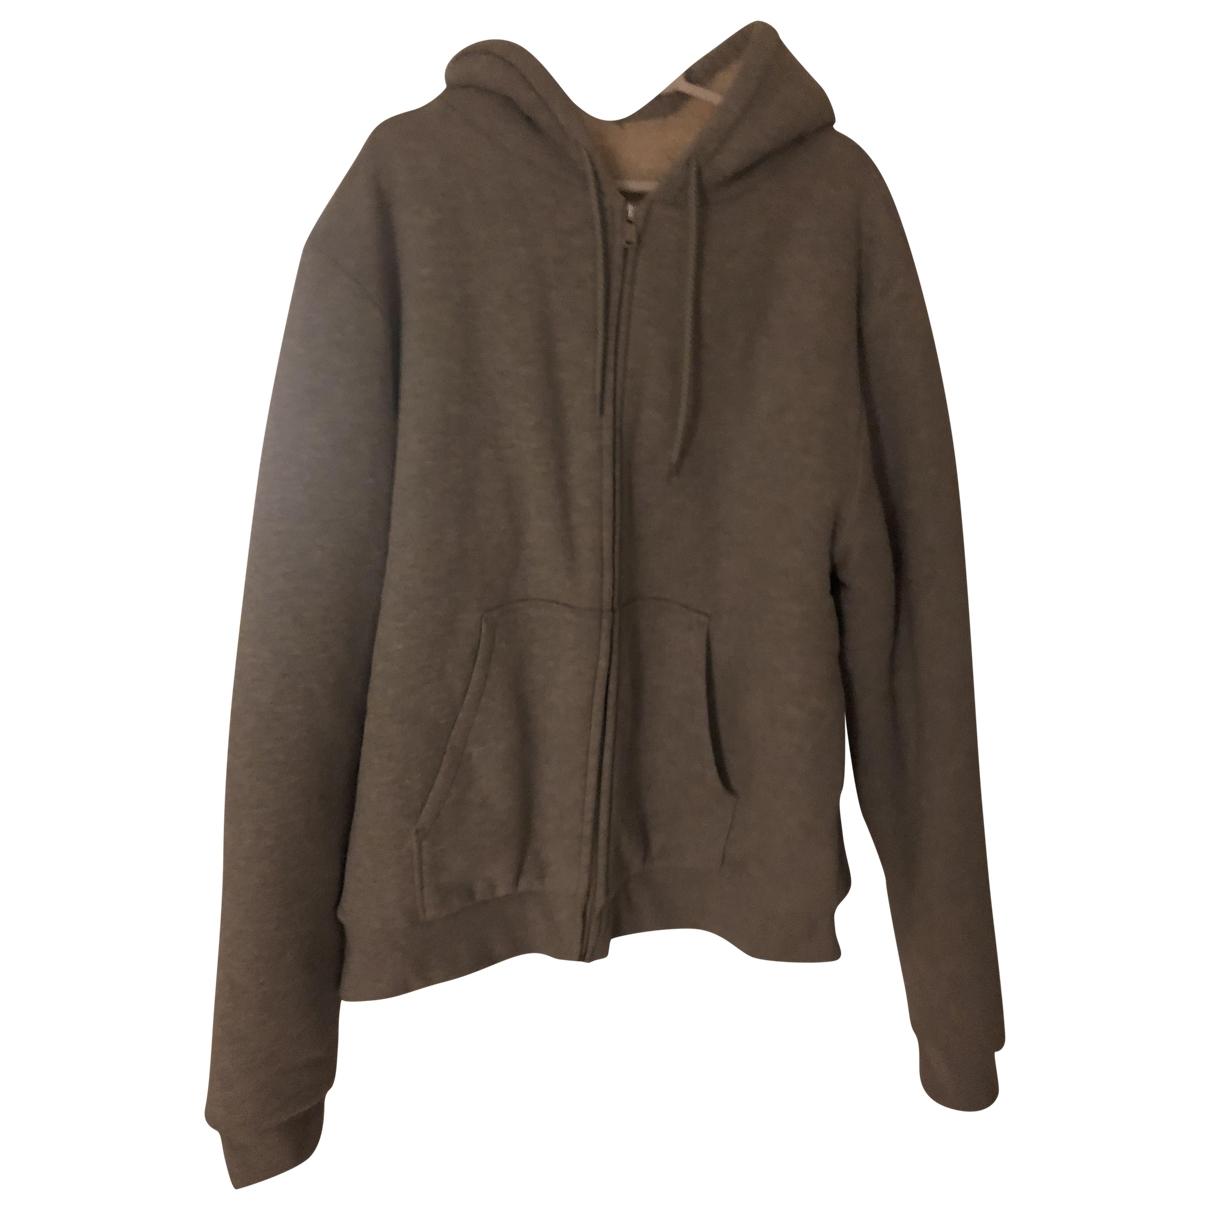 Sandro Fall Winter 2019 Pullover.Westen.Sweatshirts  in  Grau Polyester